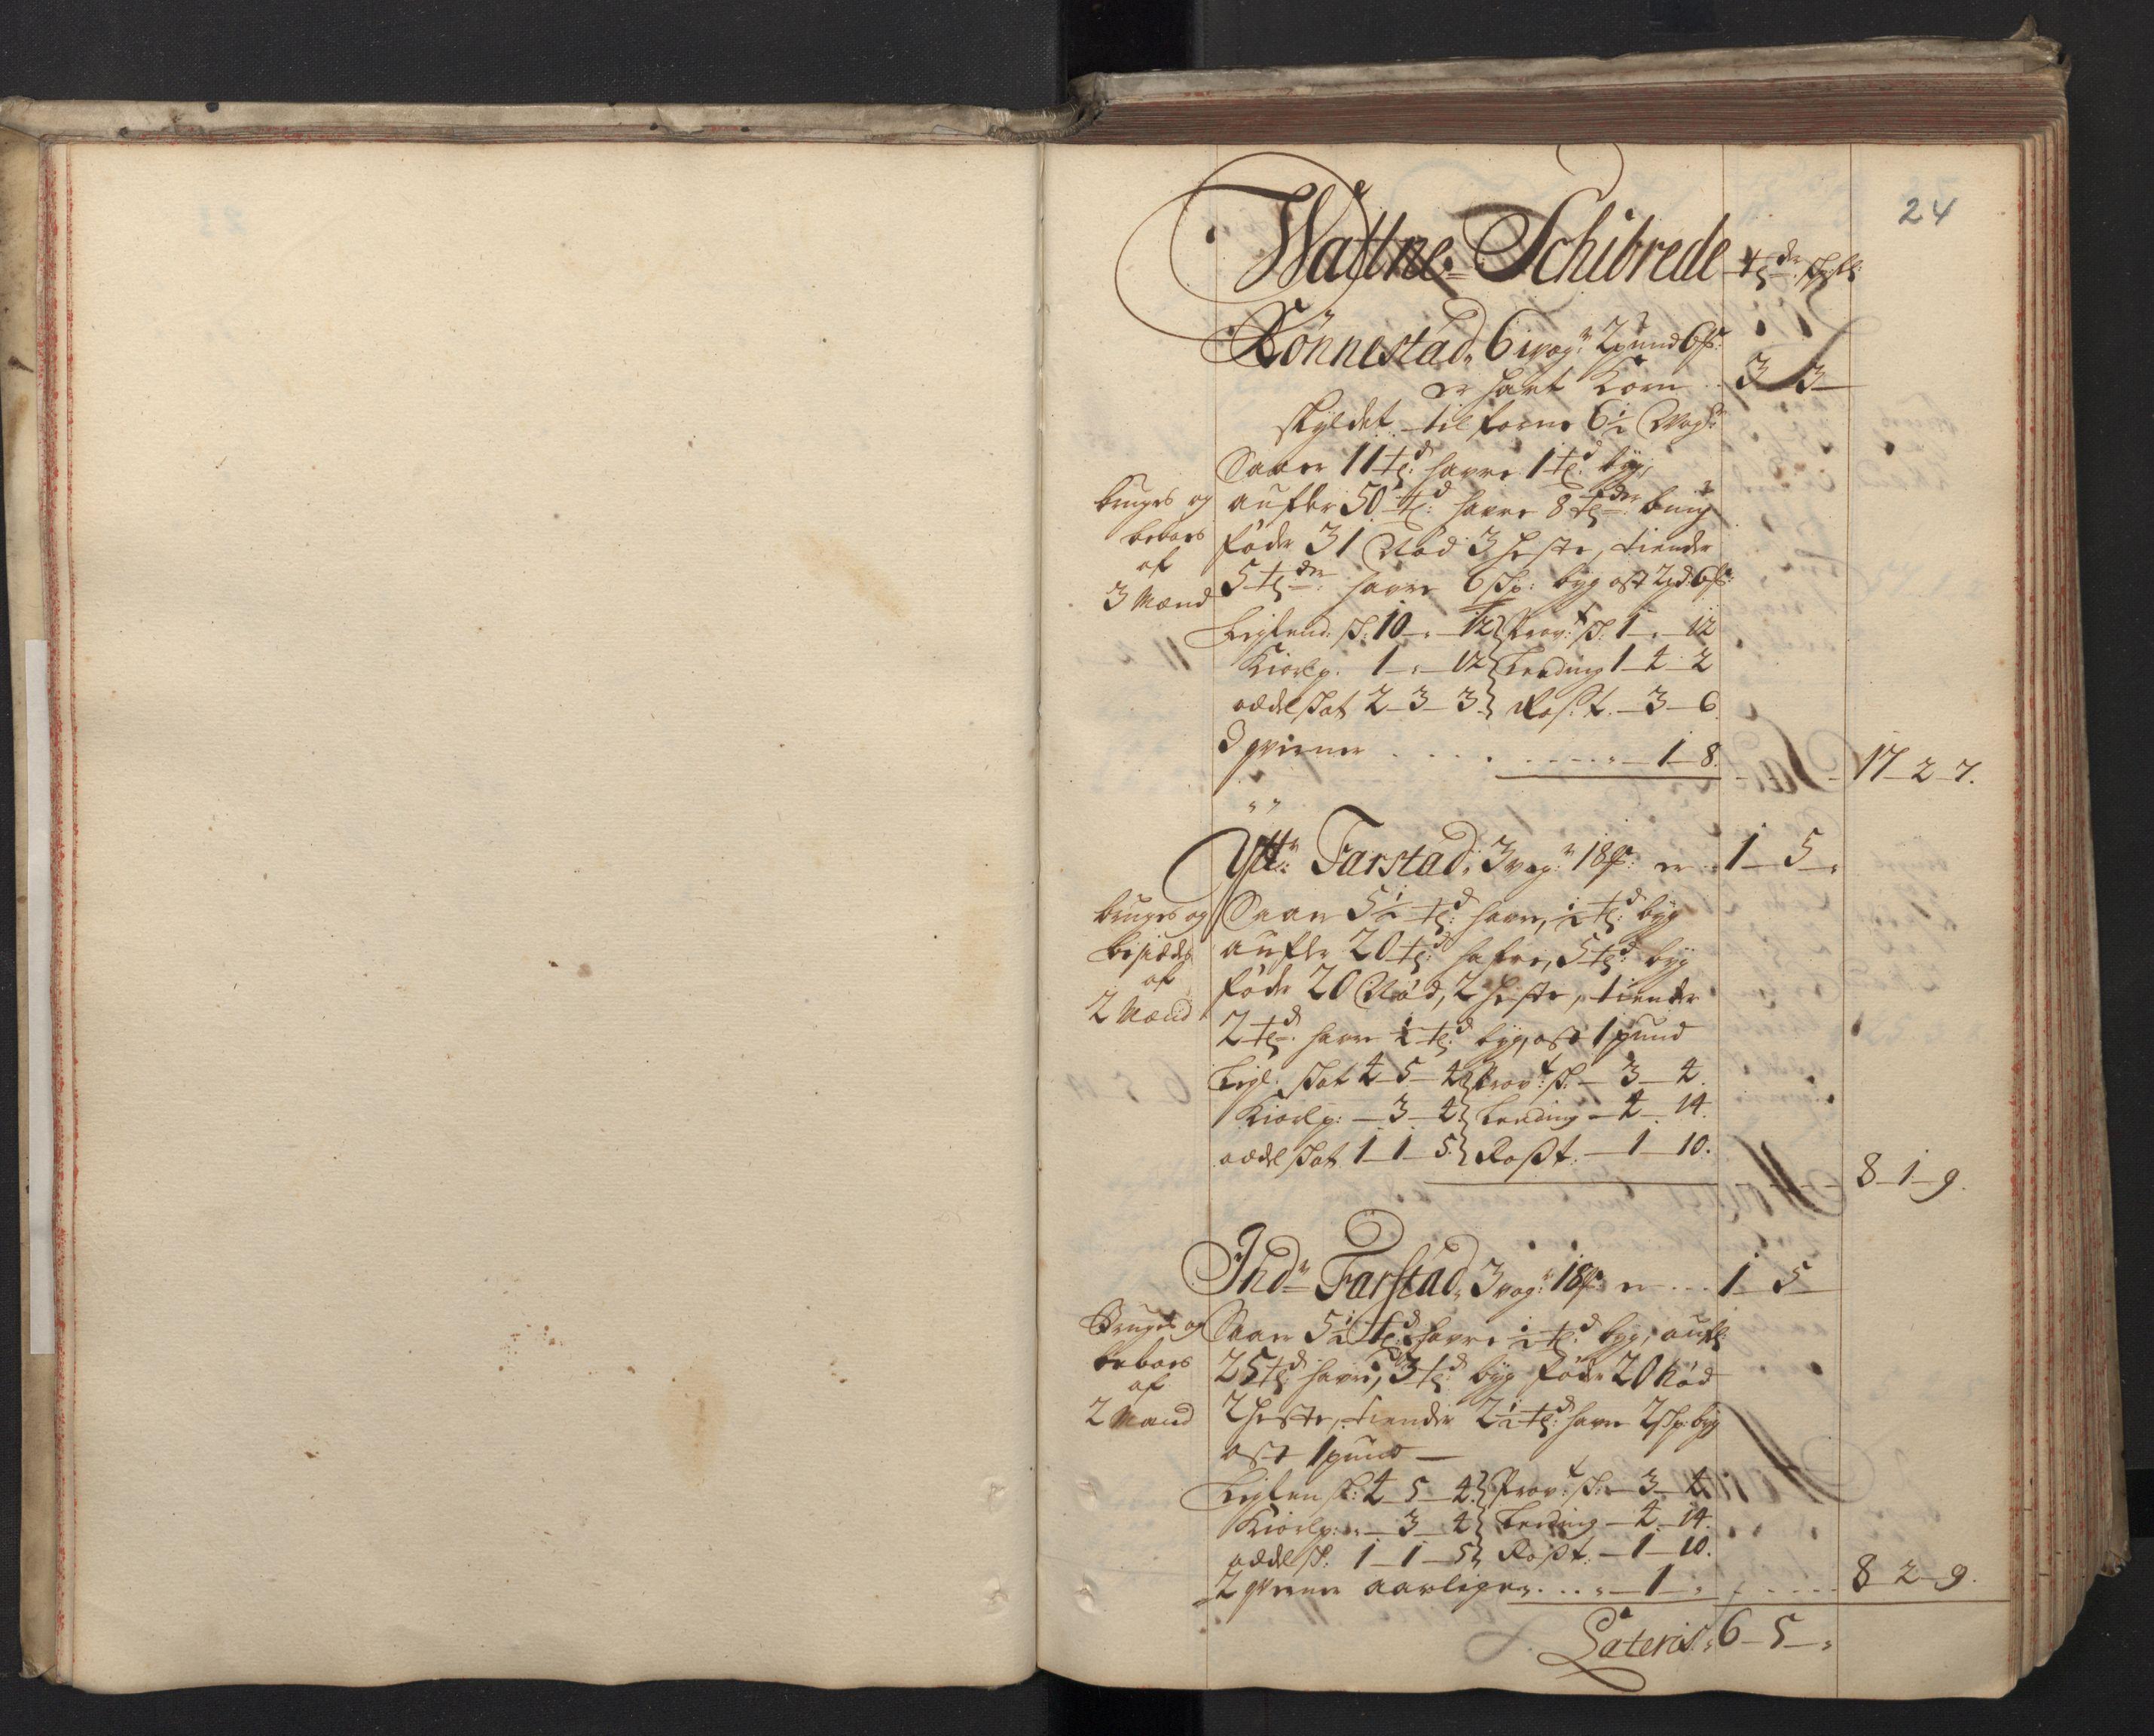 RA, Rentekammeret inntil 1814, Realistisk ordnet avdeling, N/Nb/Nbf/L0148: Sunnmøre, prøvematrikkel, 1714, s. 23b-24a